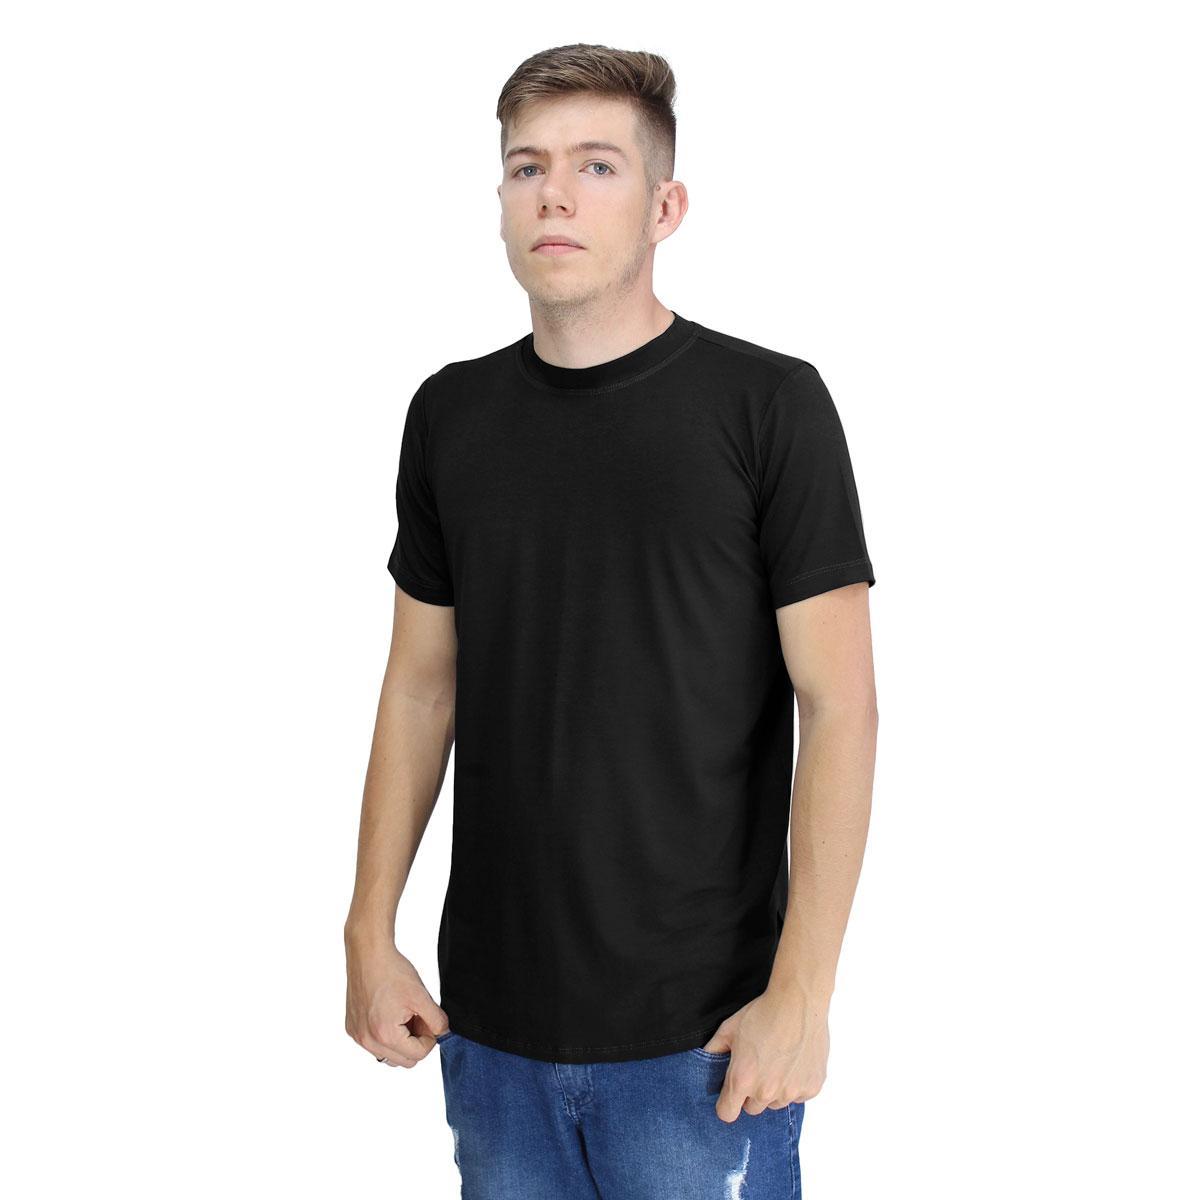 Camiseta Masculina Gola Redonda Manga Curta Lynnce